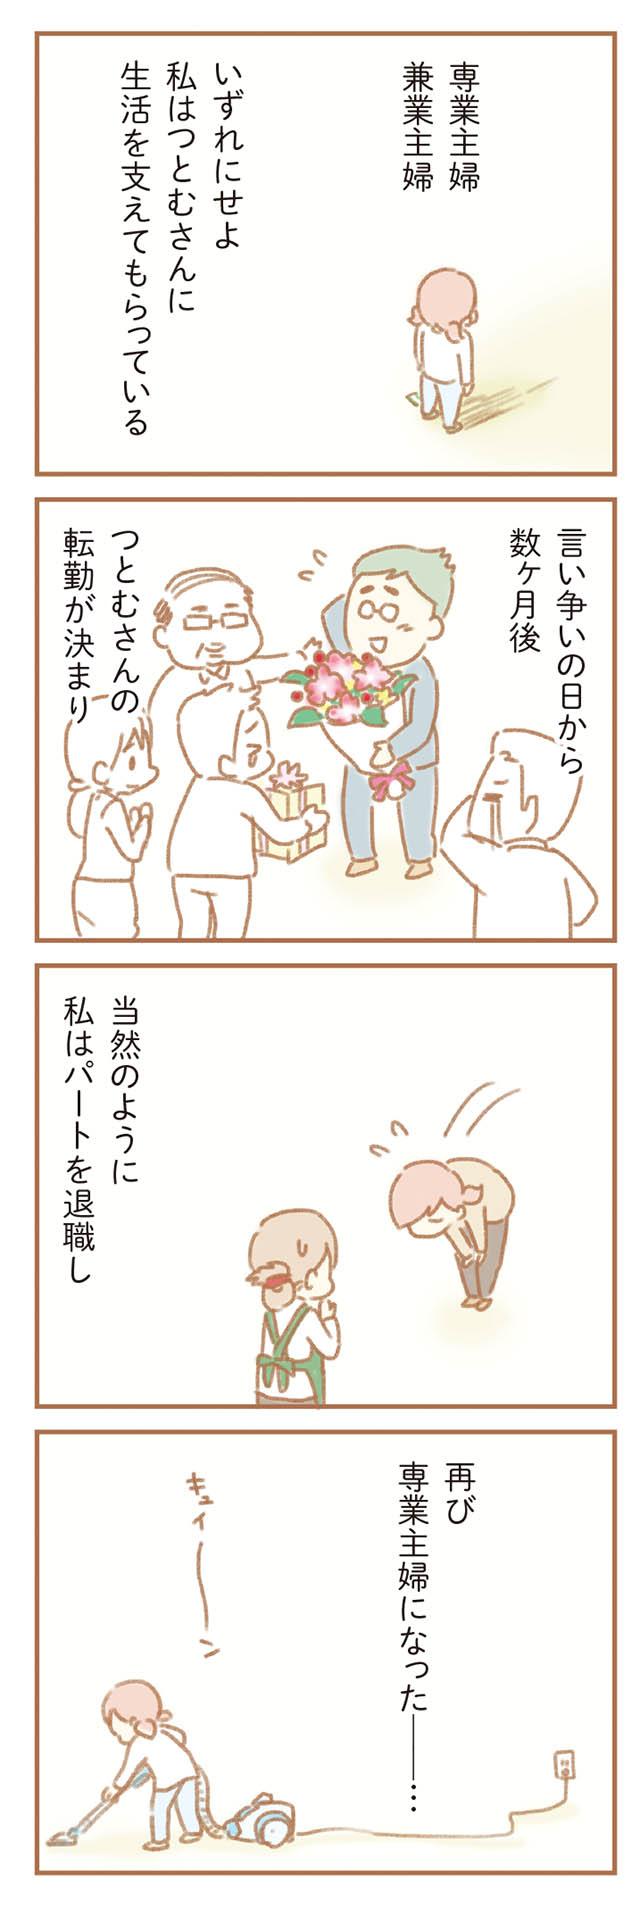 ottonohuyou_p13-1.jpg